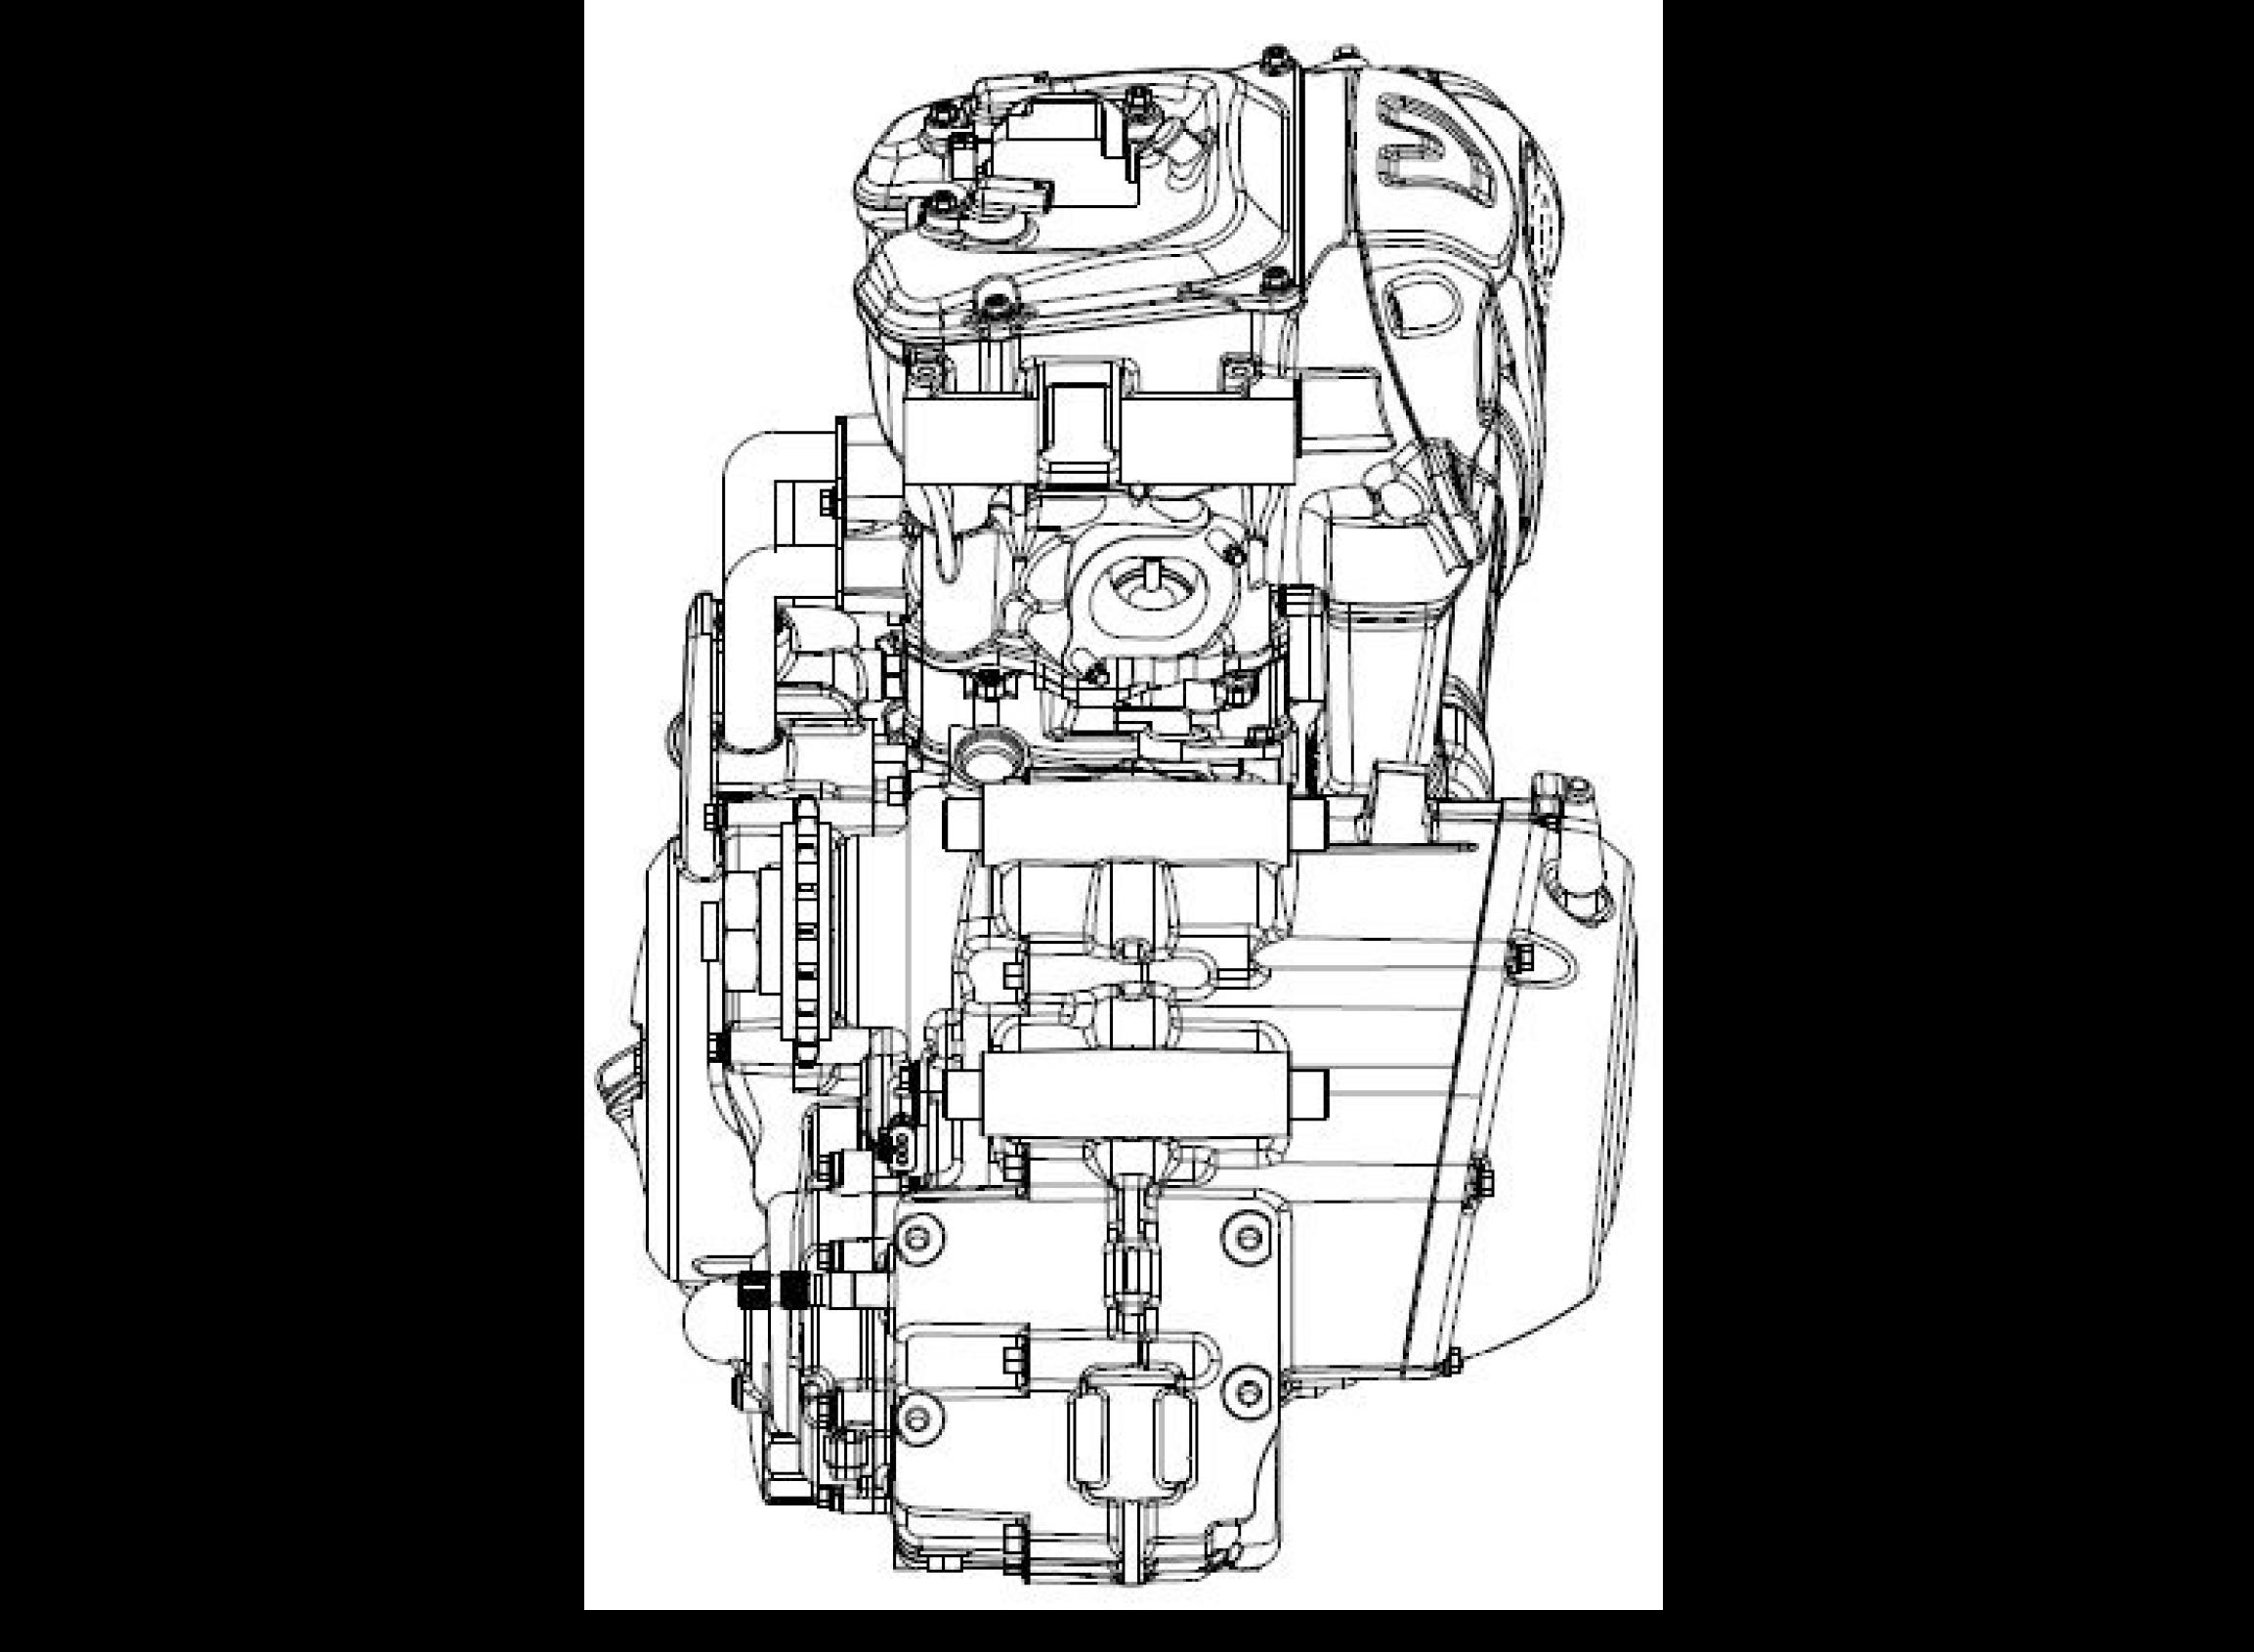 040419-harley-davidson-new-60-degree-v-twin-engine-0001-fig-5